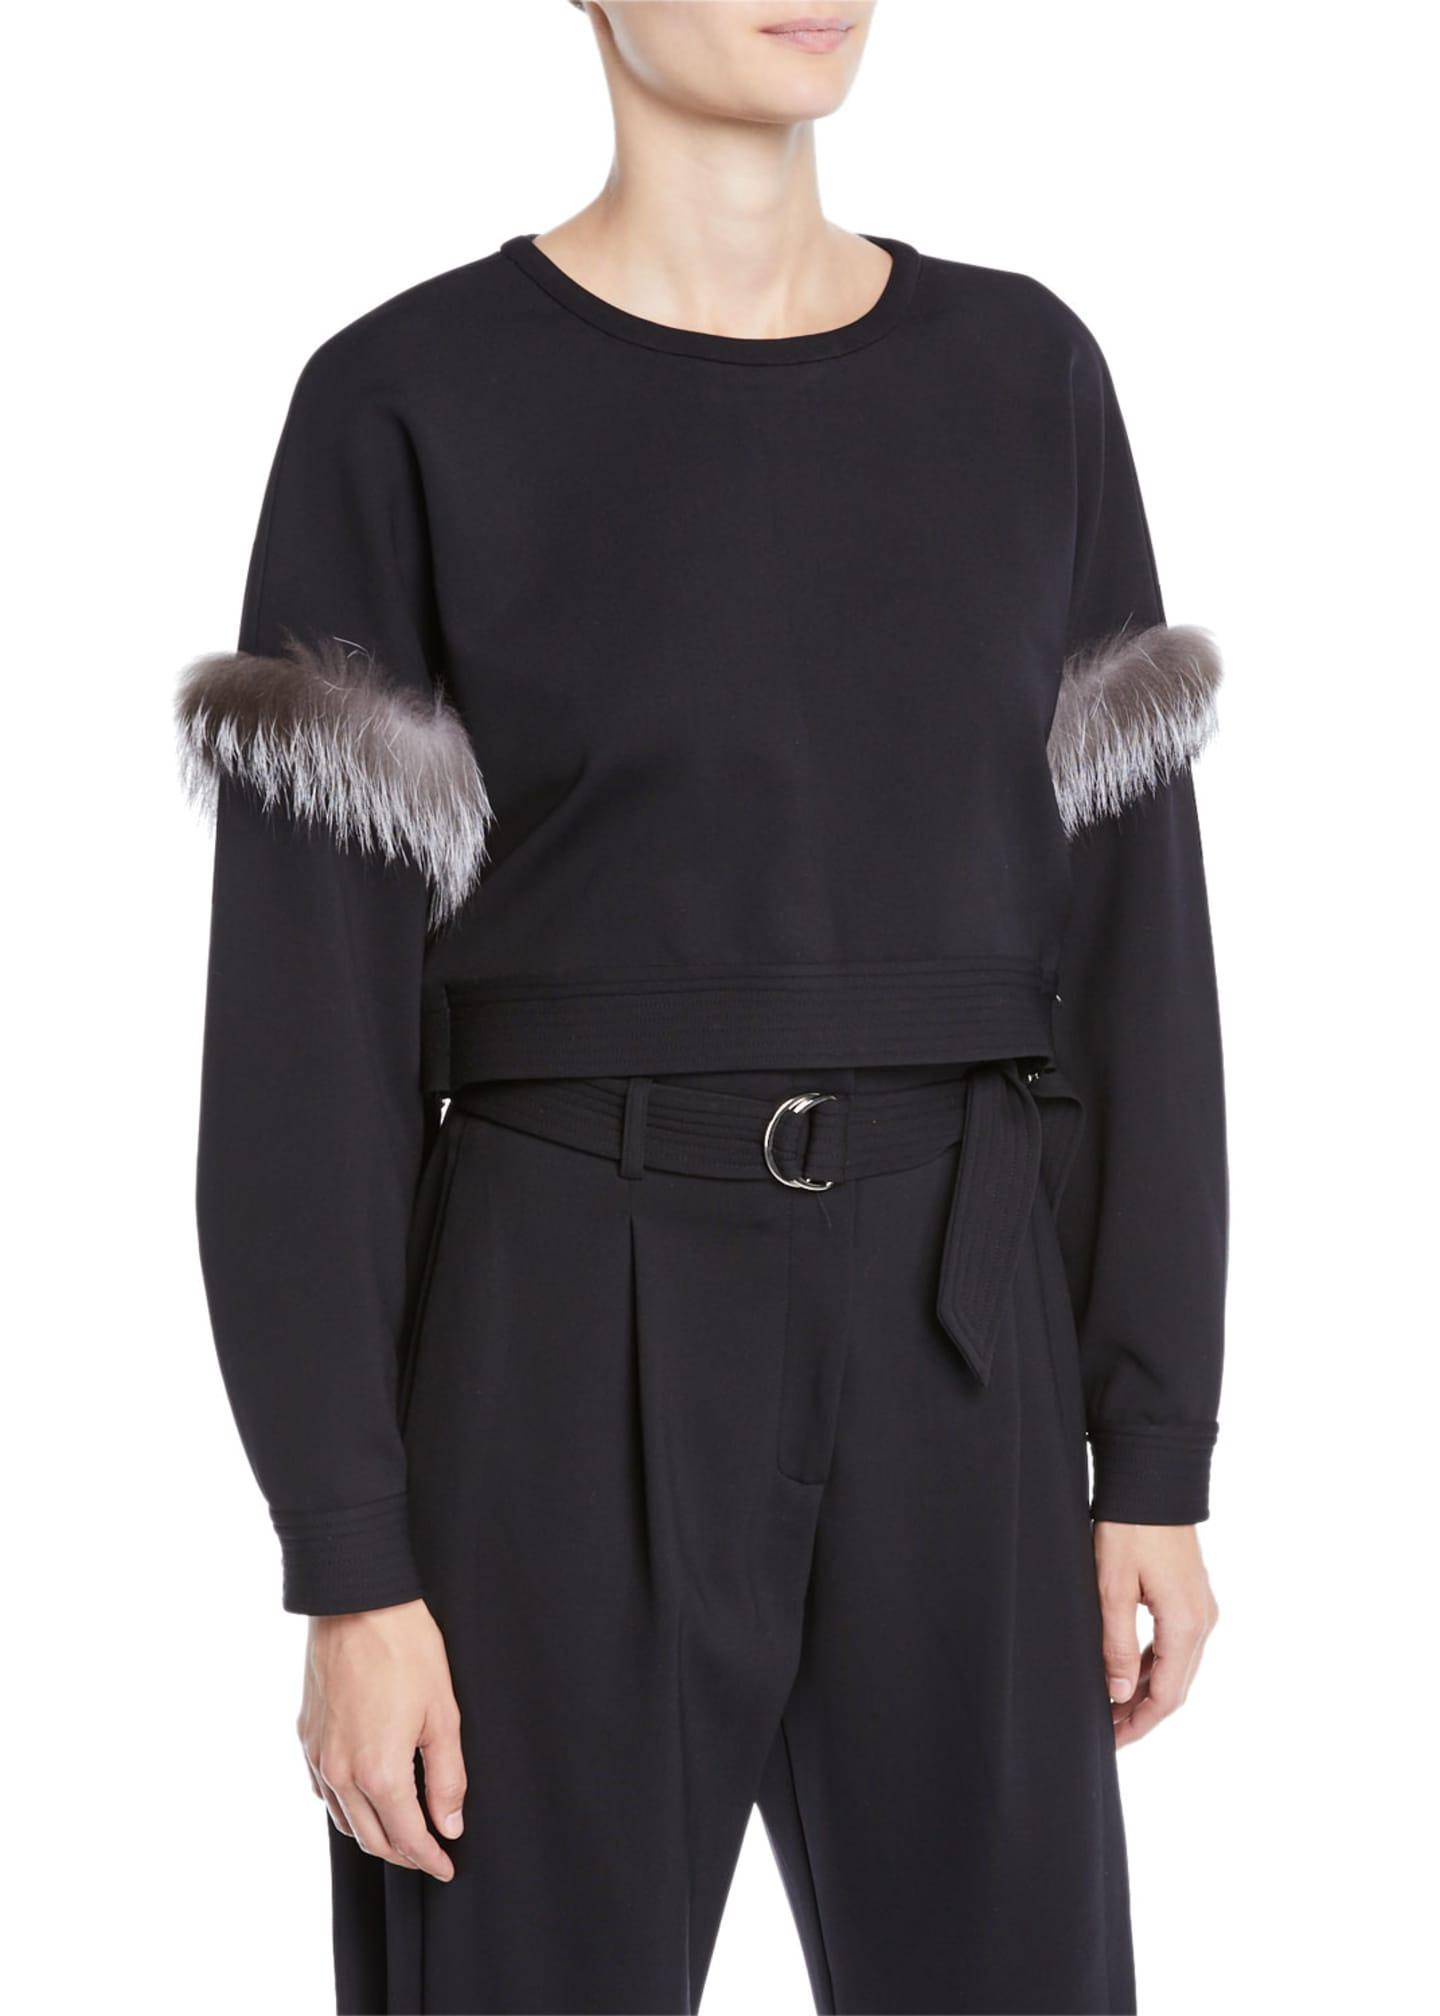 Sally LaPointe Fur-Trim Side-Tie Cropped Crewneck Top